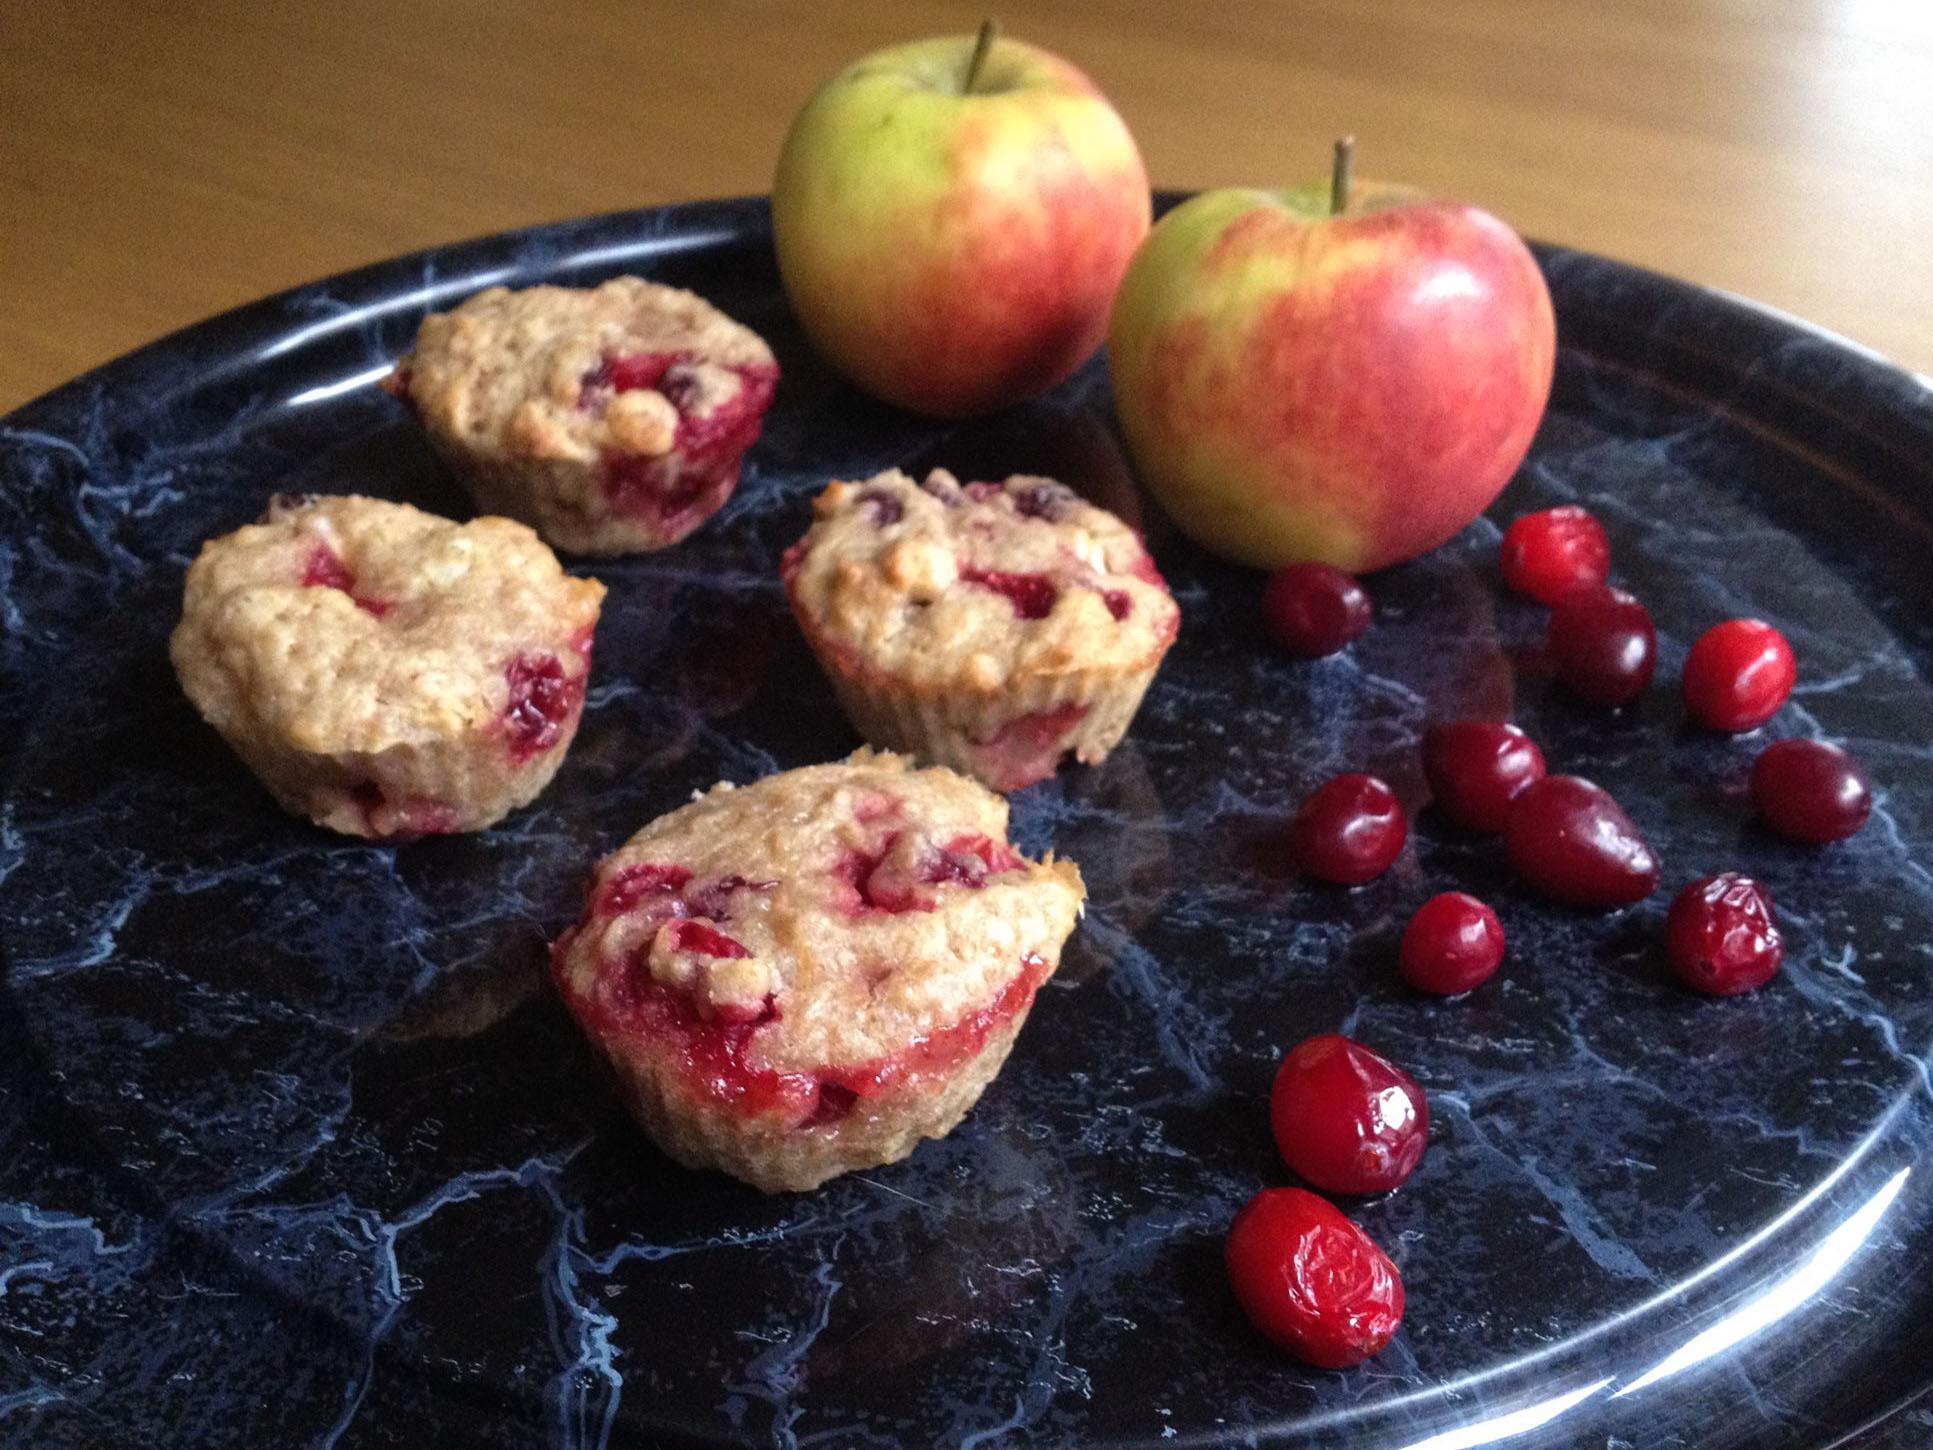 Muffins met veenbes en appel | Julienne